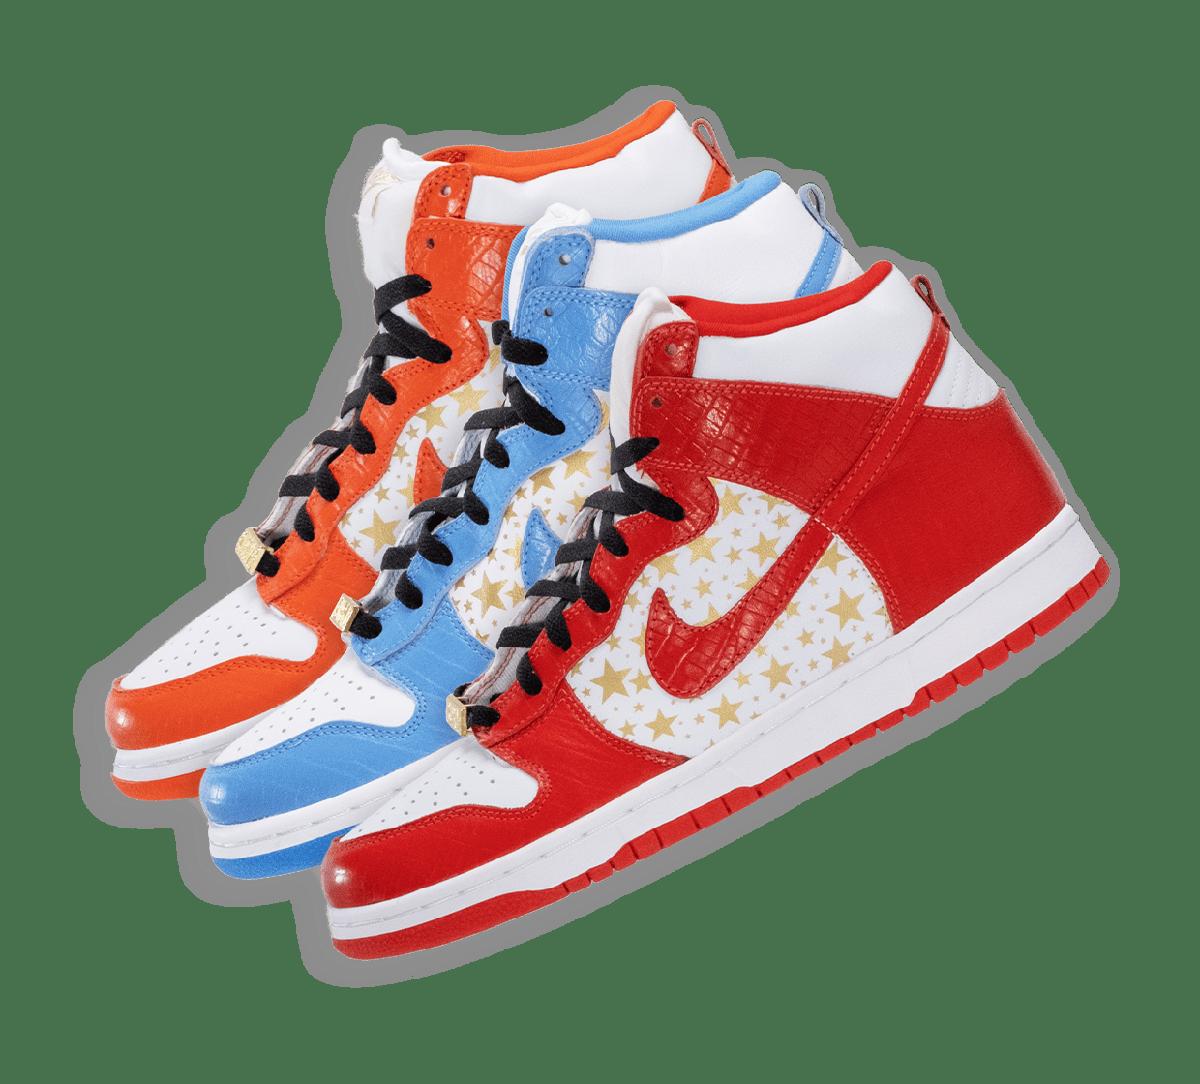 Nike SB Dunk High Pro Supreme Collection Image